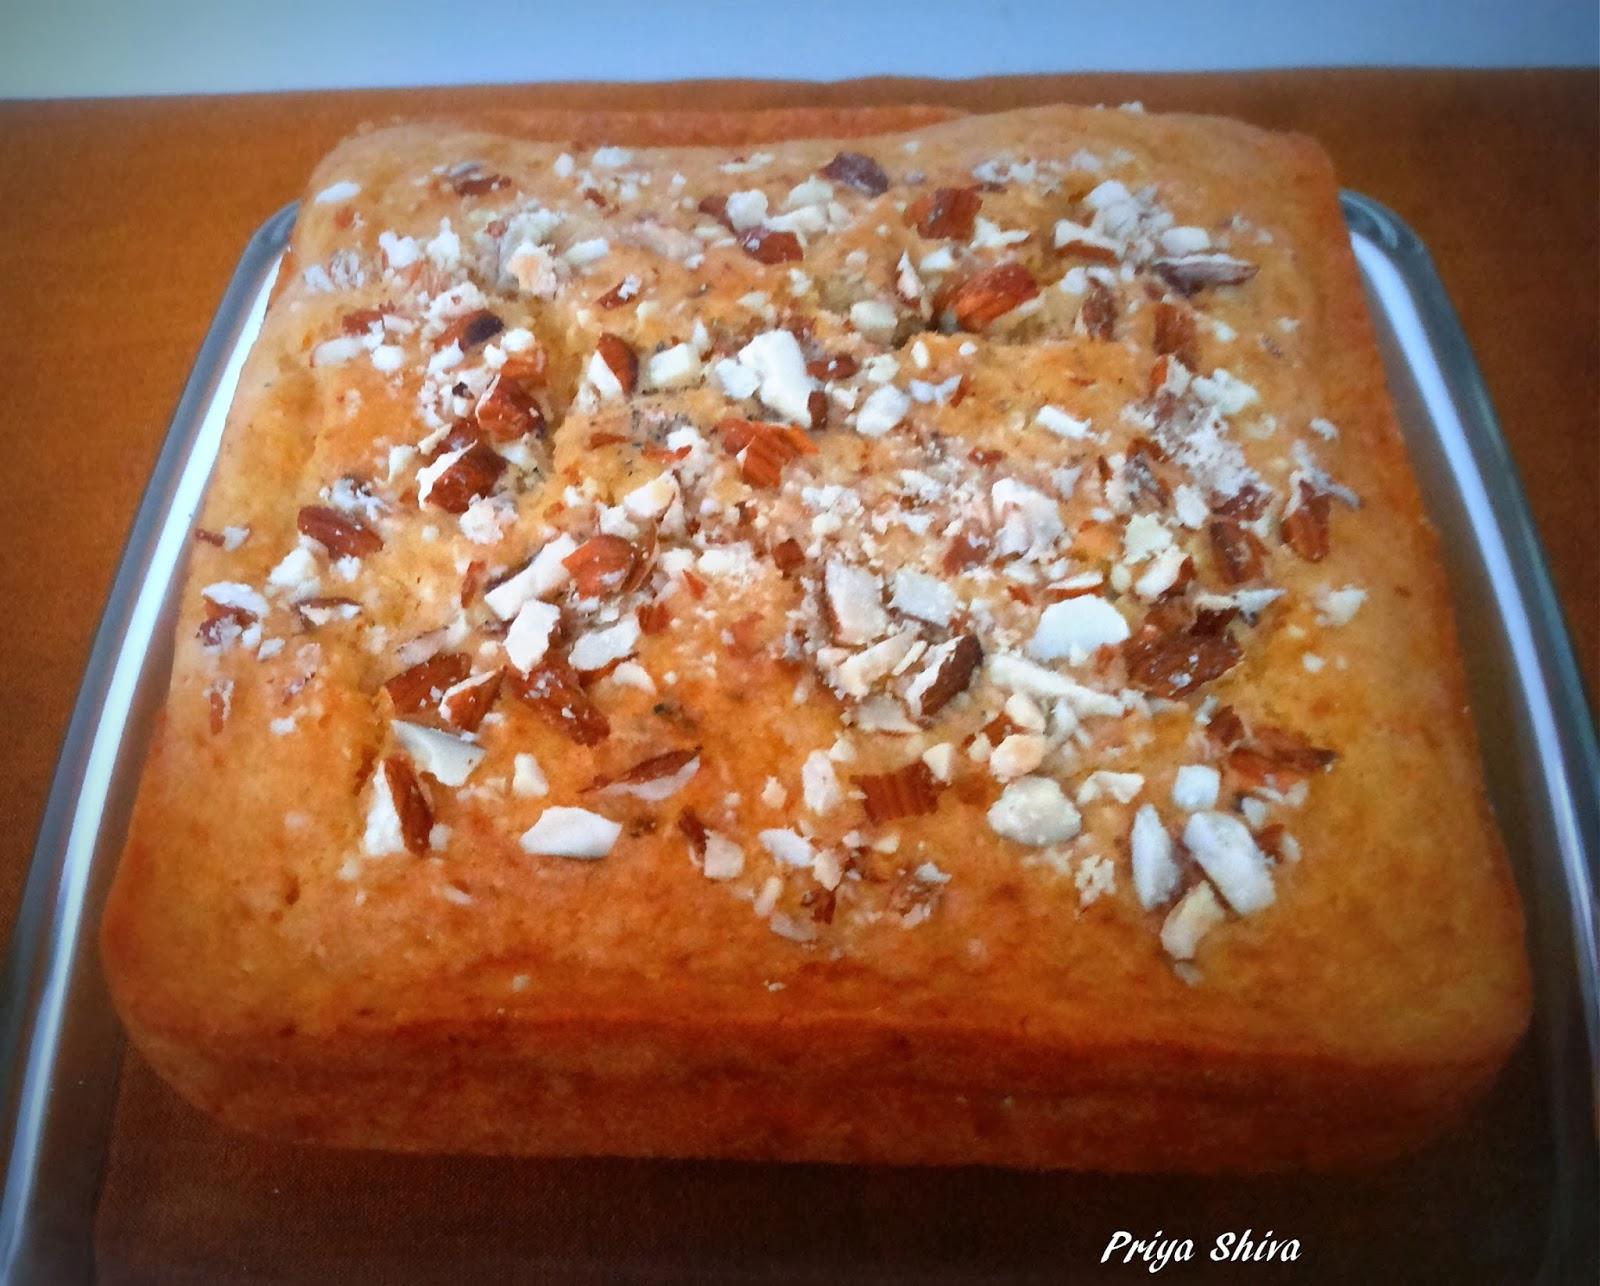 Eggless Almond Carrot Cake